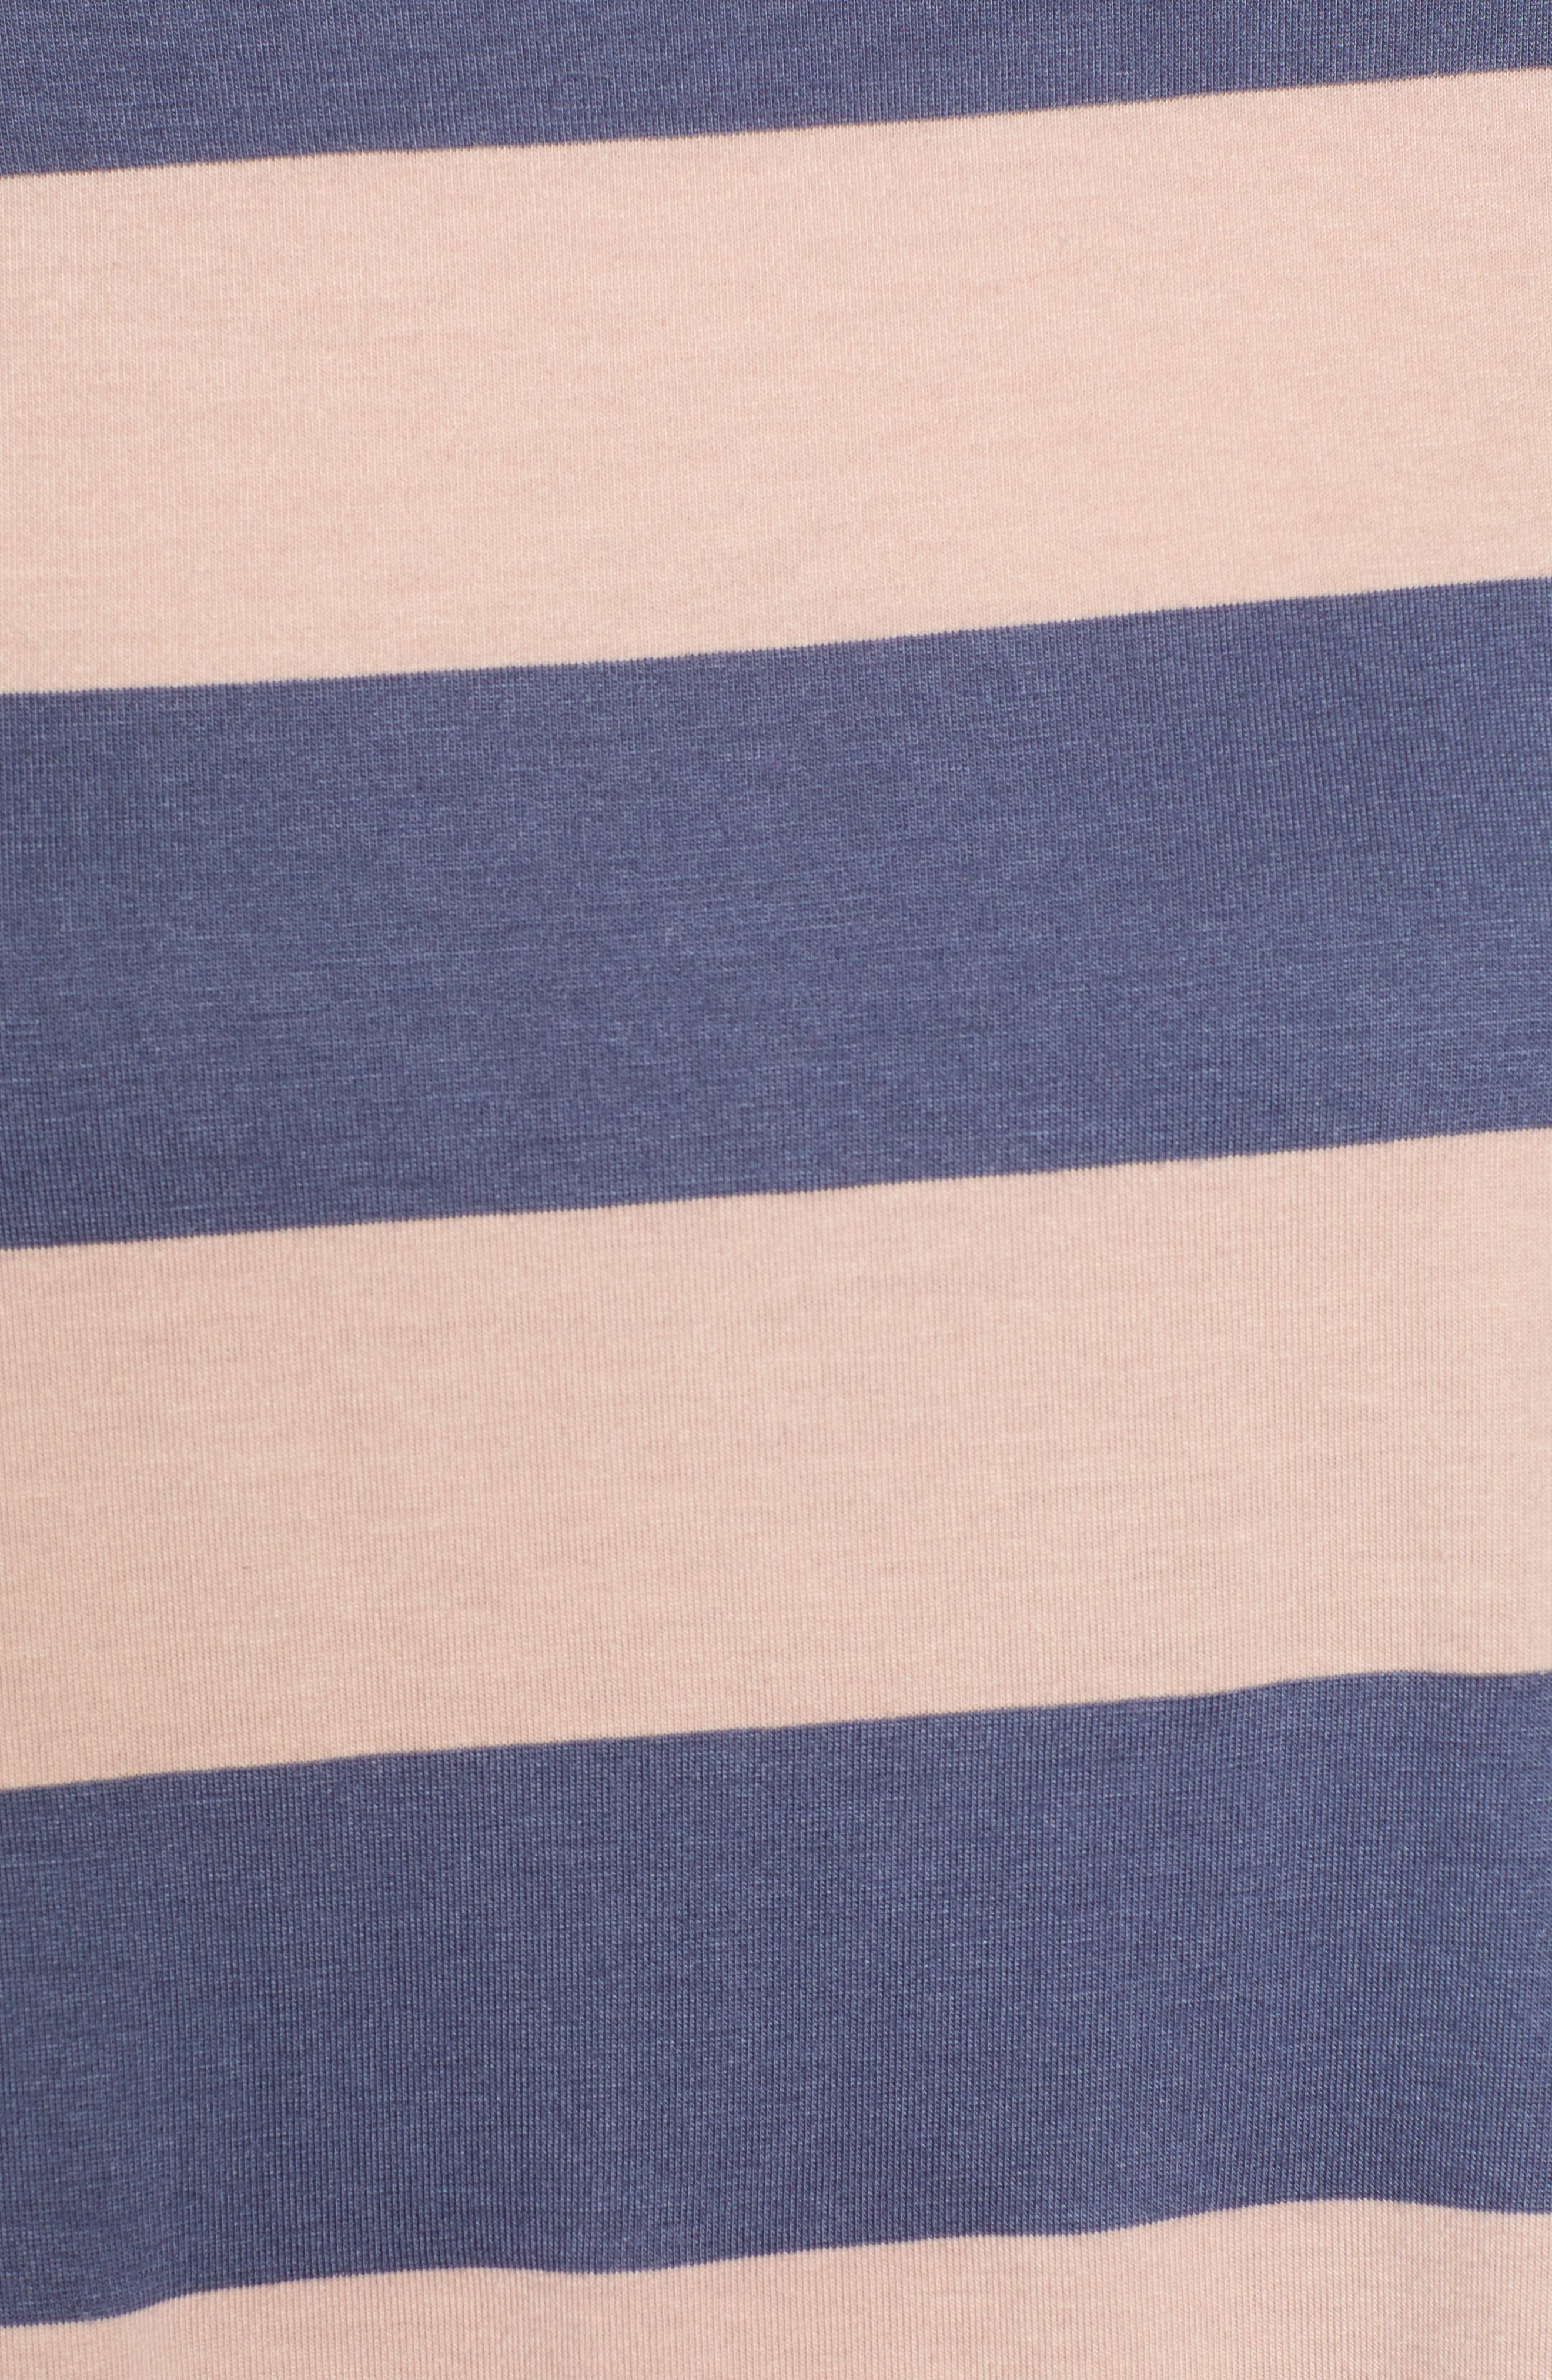 Stripe Tee,                             Alternate thumbnail 5, color,                             650